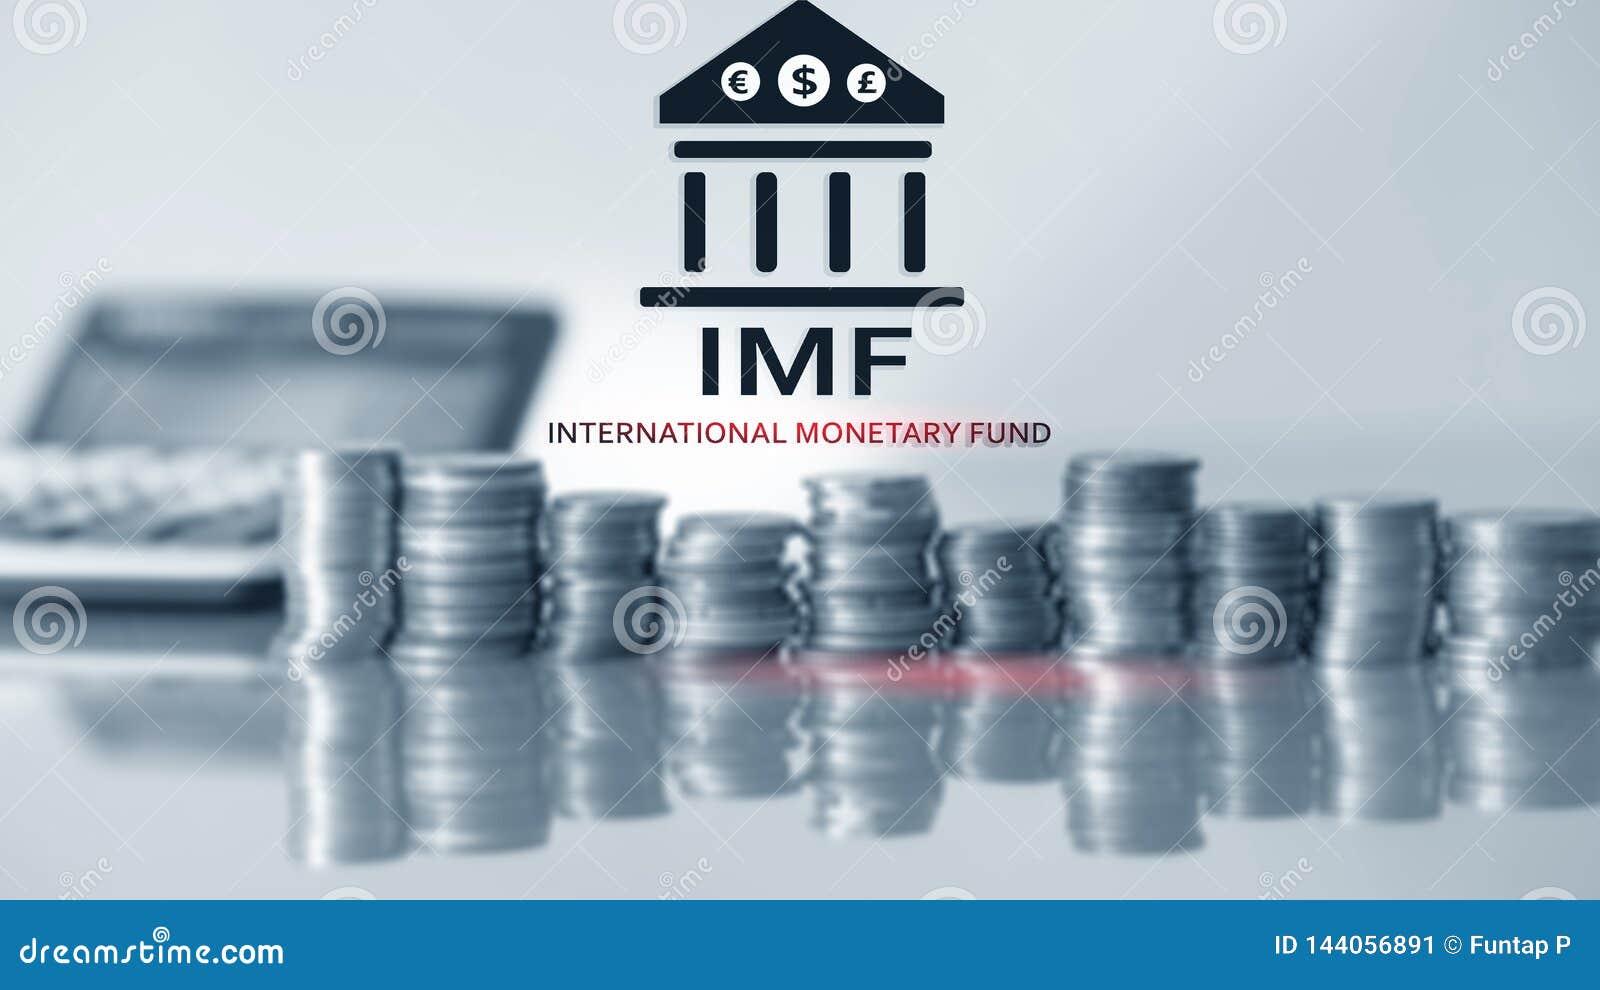 IMF. International Monetary Fund. Finance and banking concept 2.0